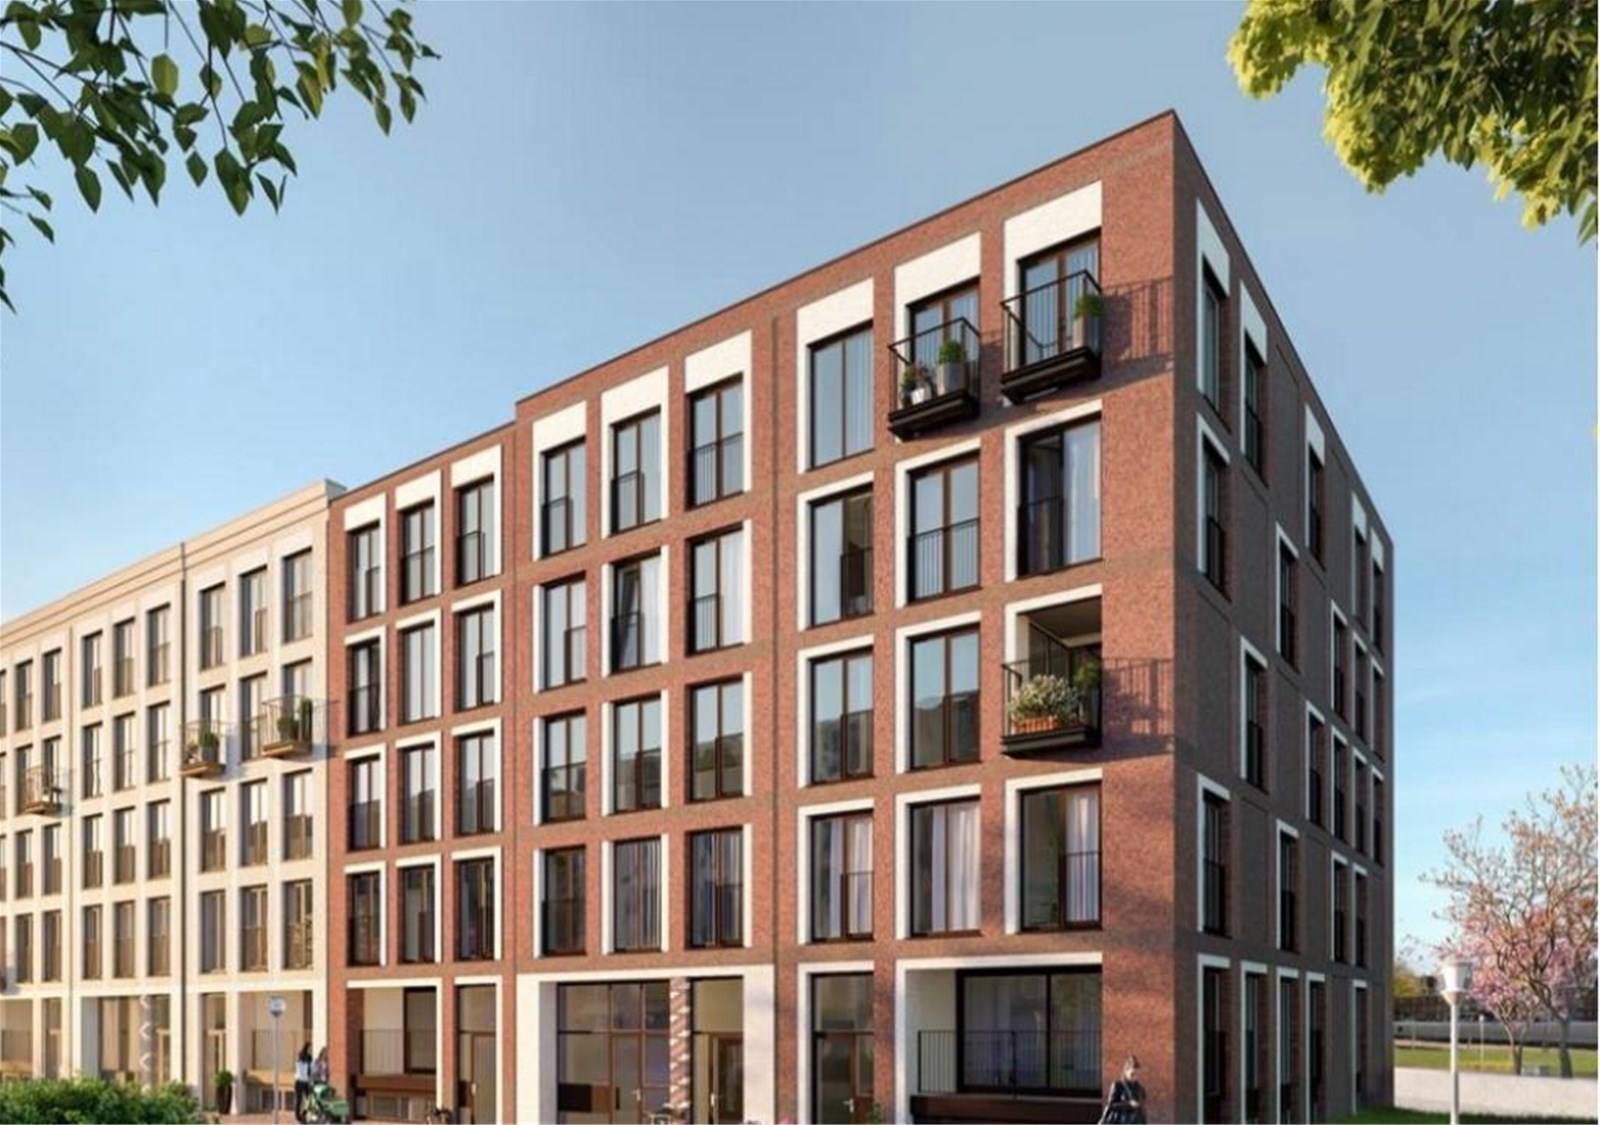 Bouwnummer 2 1014 ZG Amsterdam, Houthavens West - MVA nieuwbouw